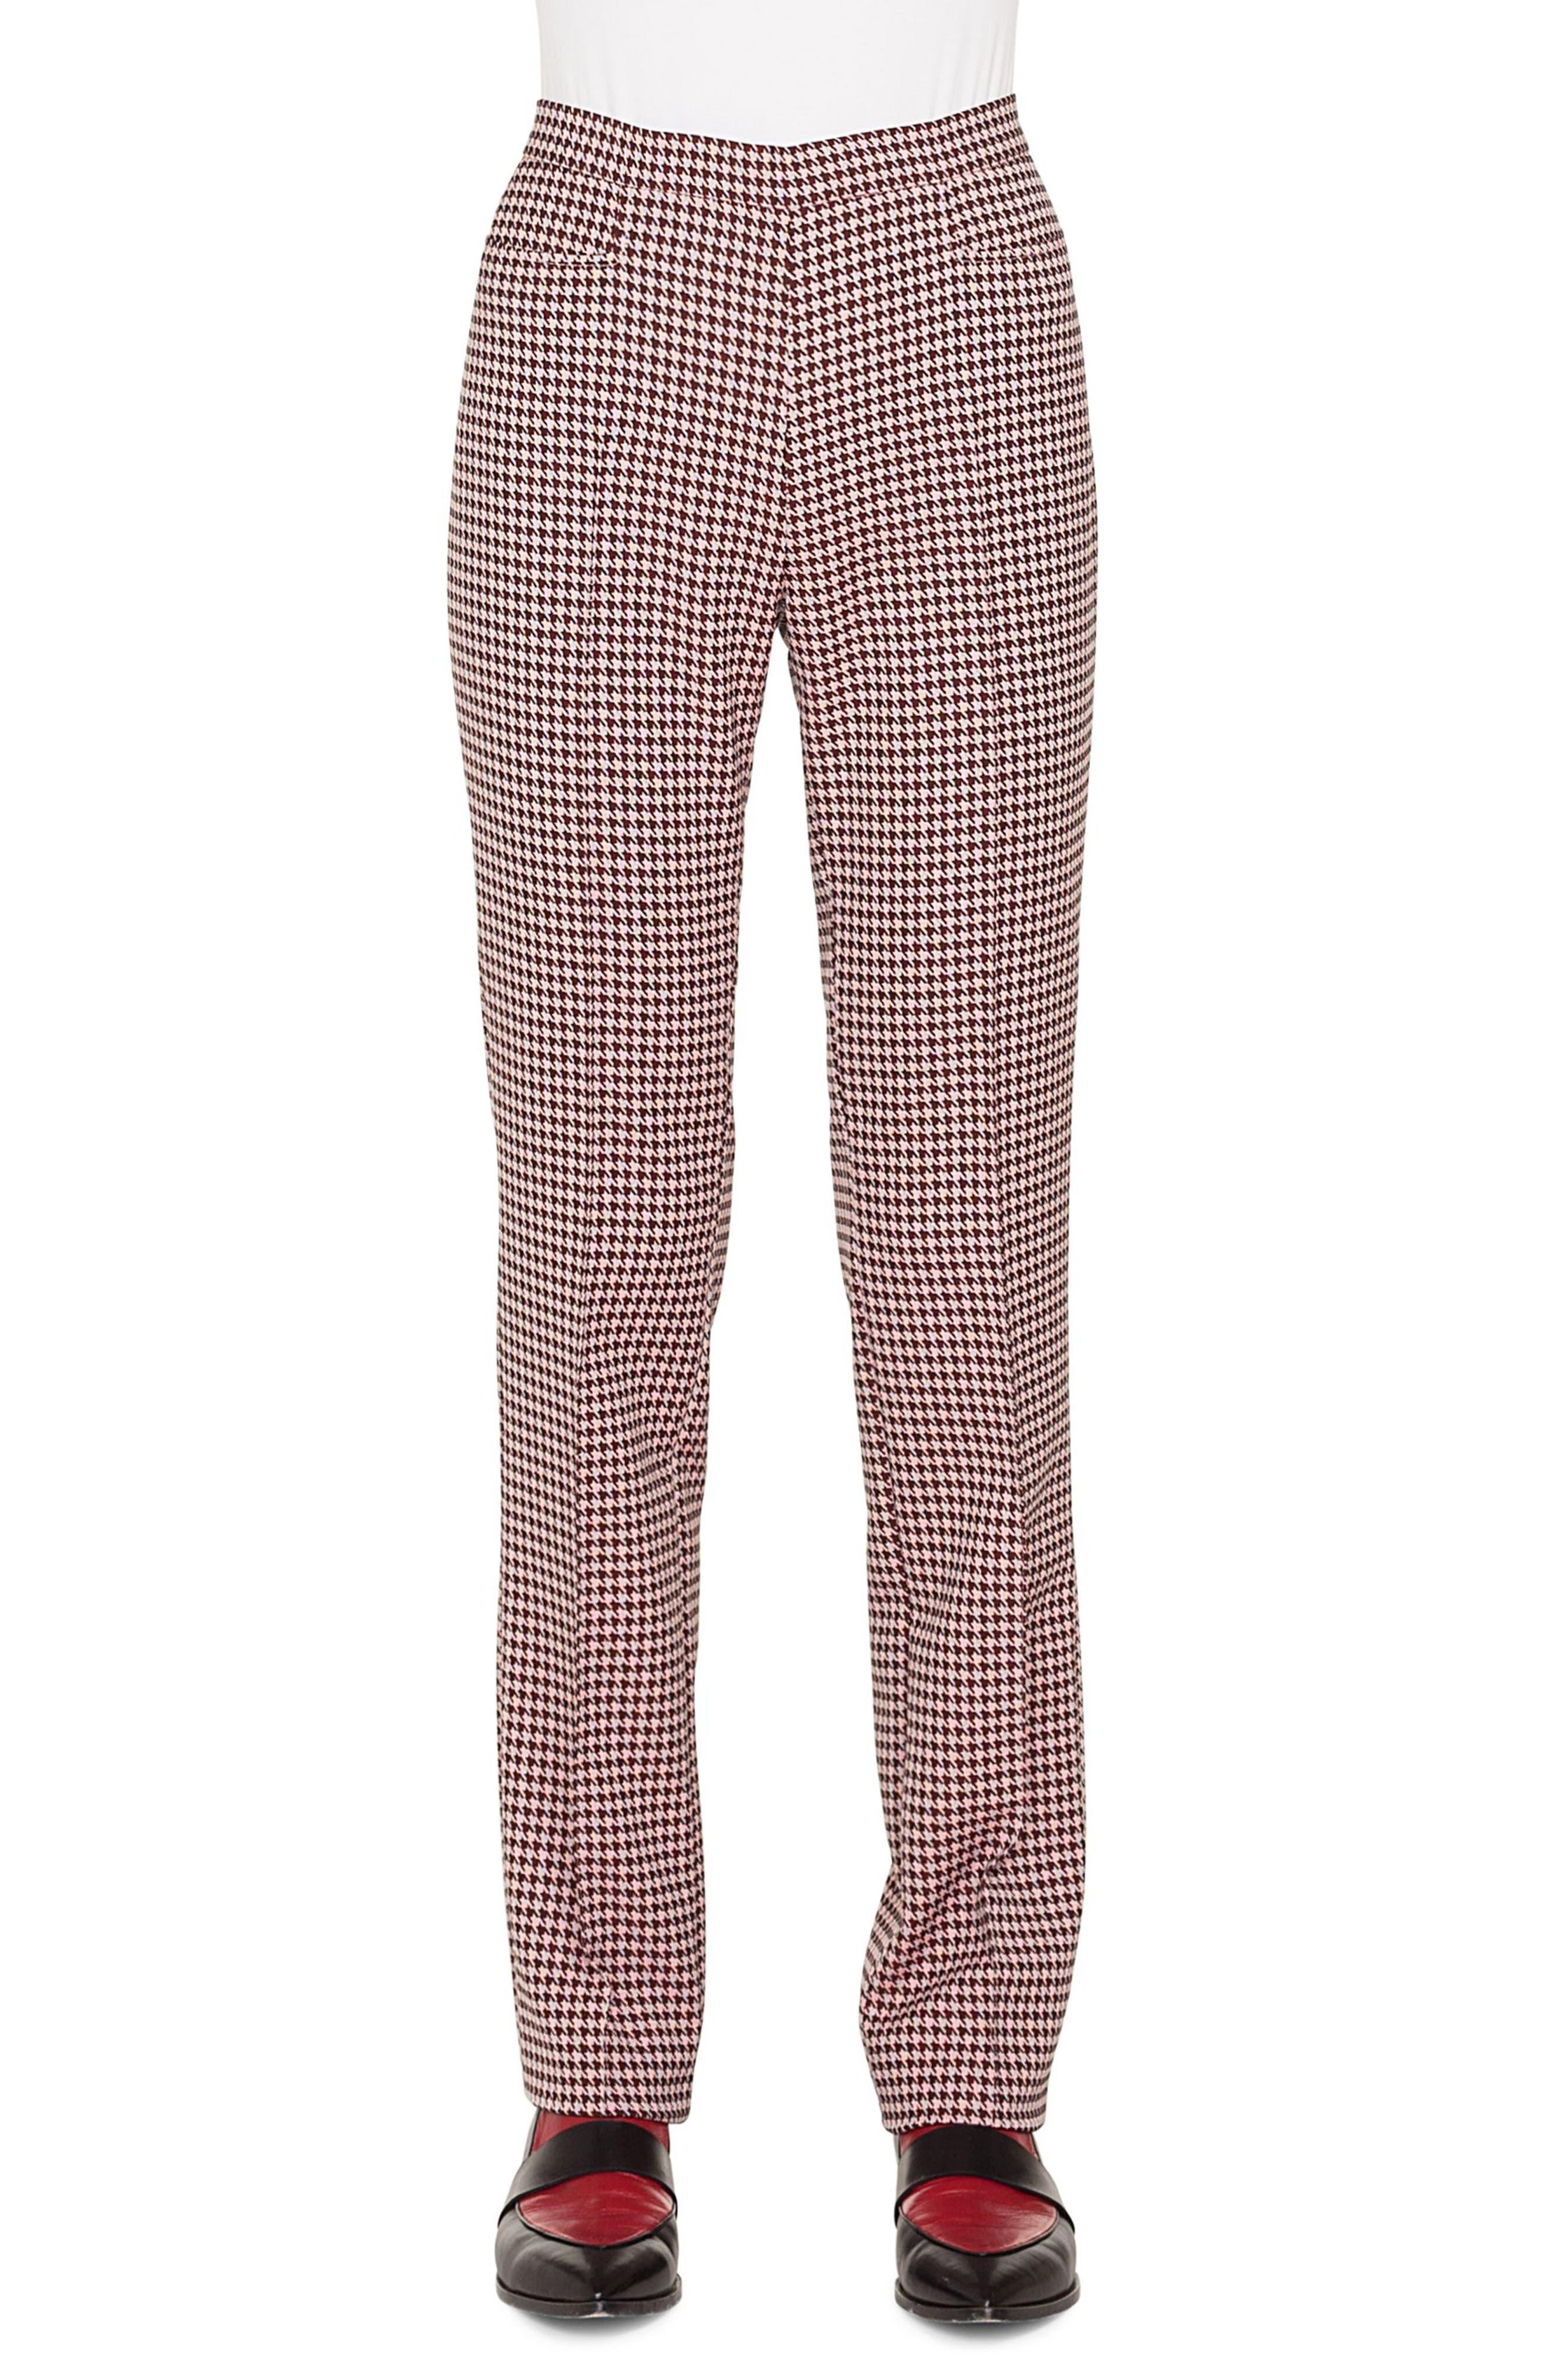 AKRIS PUNTO Francoise Houndstooth Jersey Pants, Main, color, 930